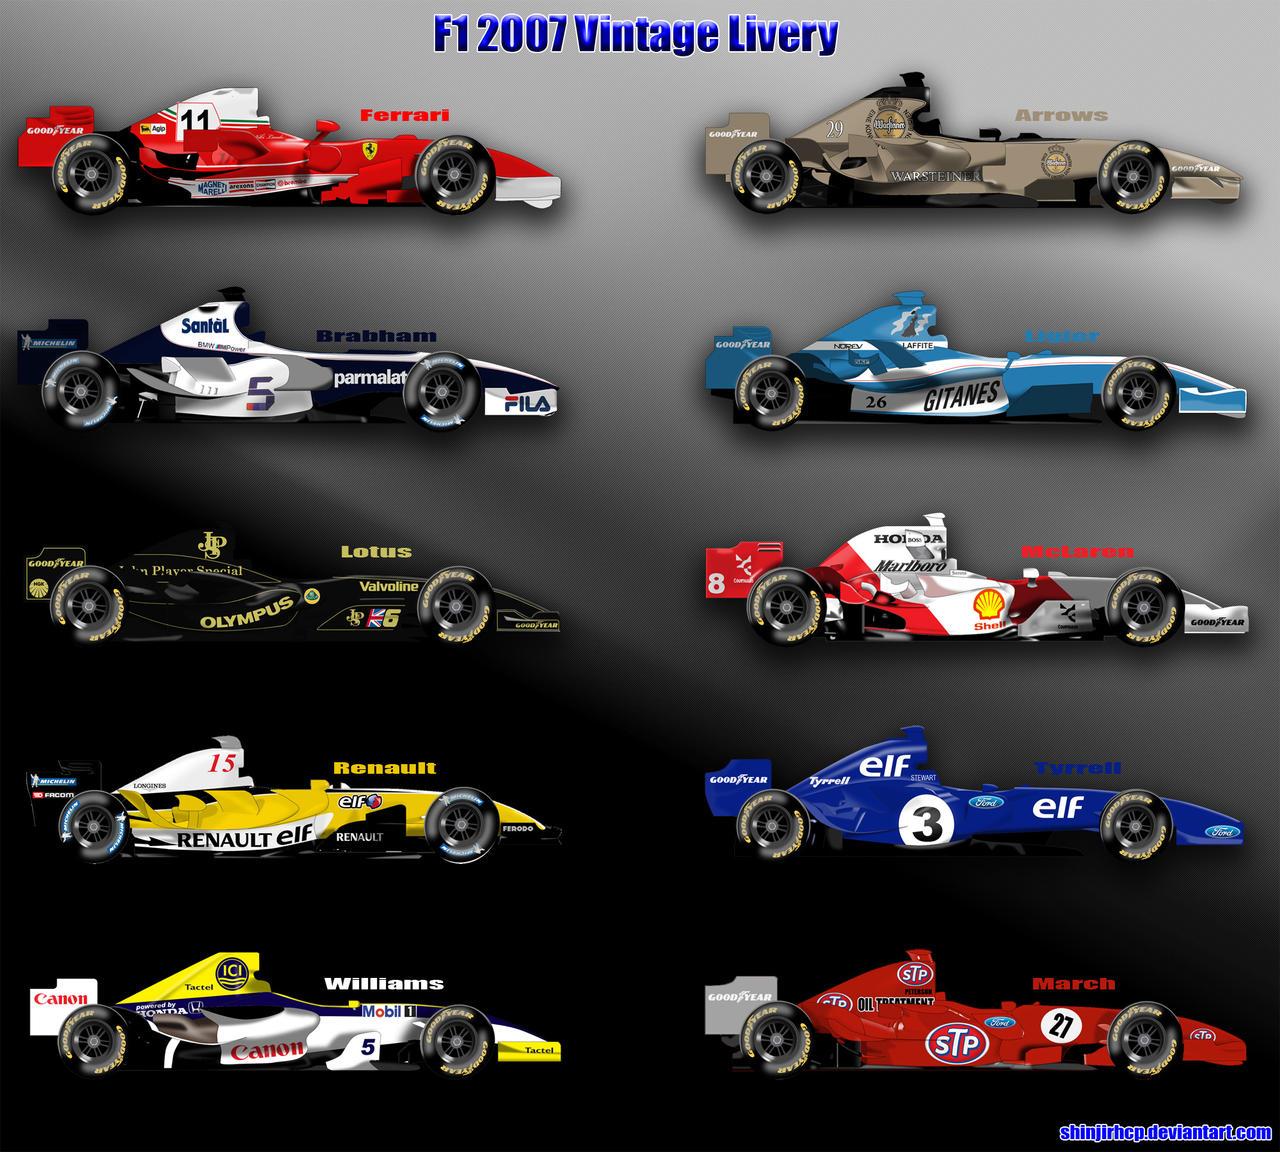 F1 2007 Vintage Livery by ShinjiRHCP